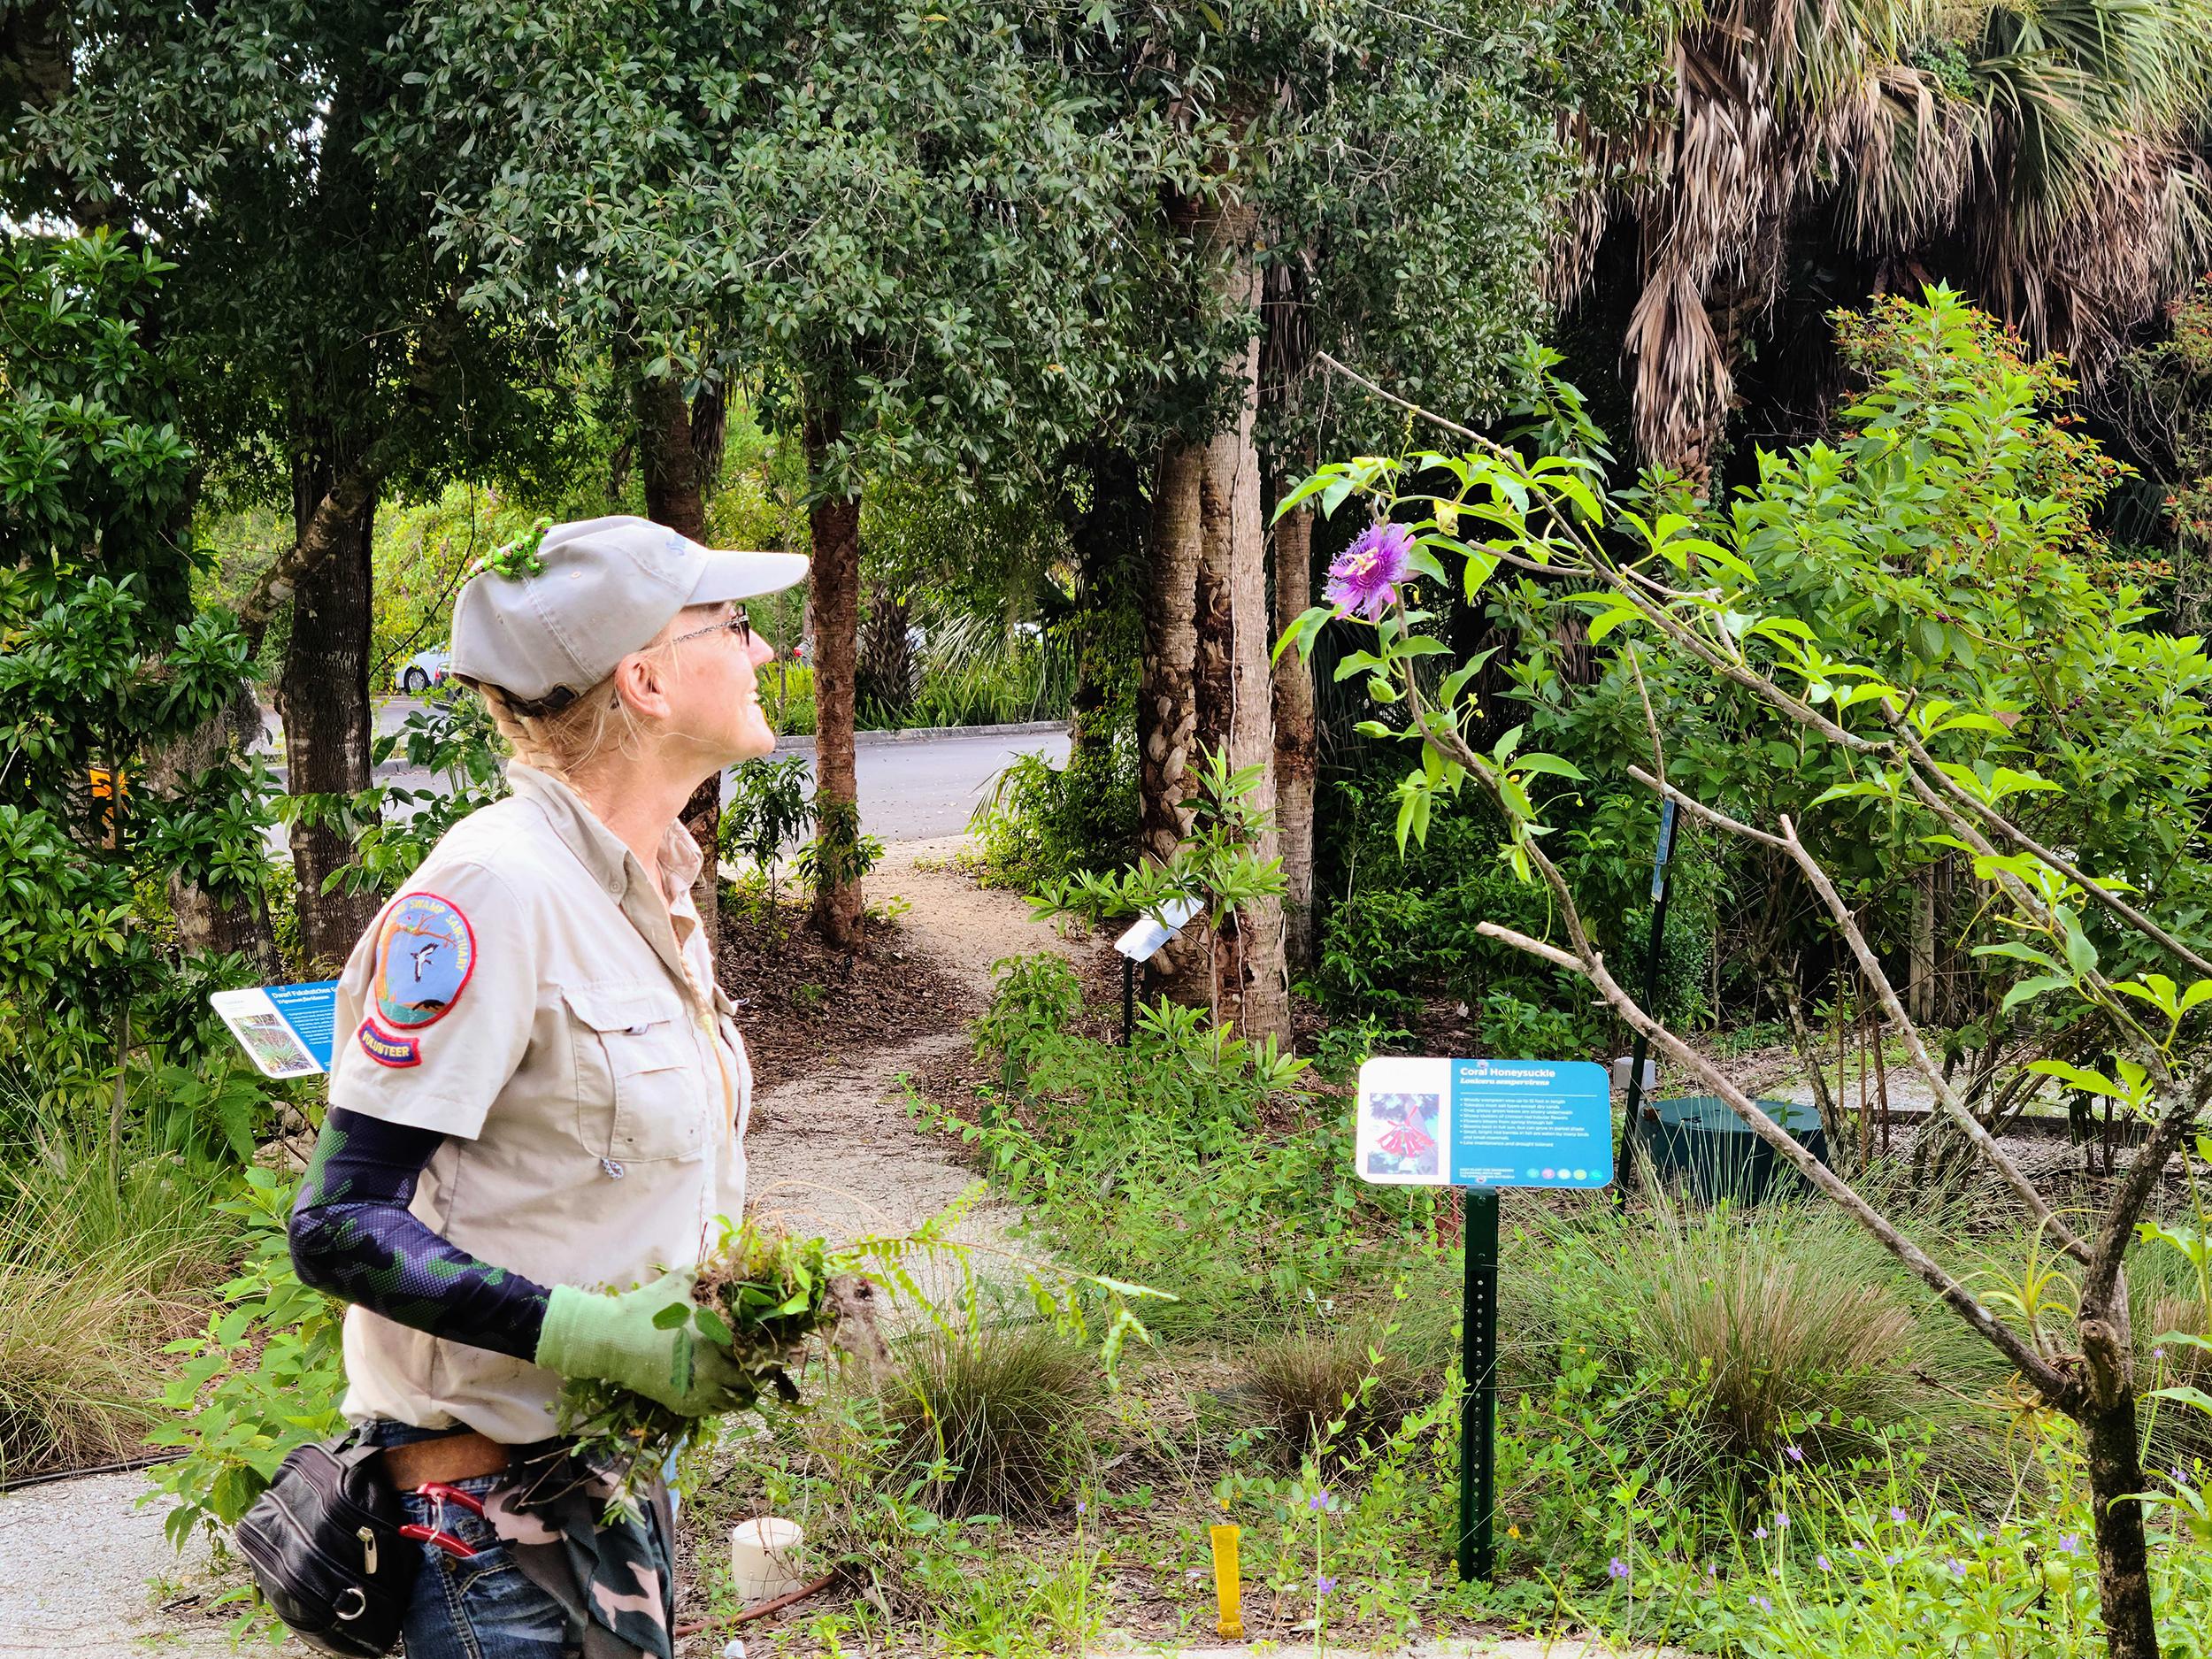 Volunteer at pollinator garden